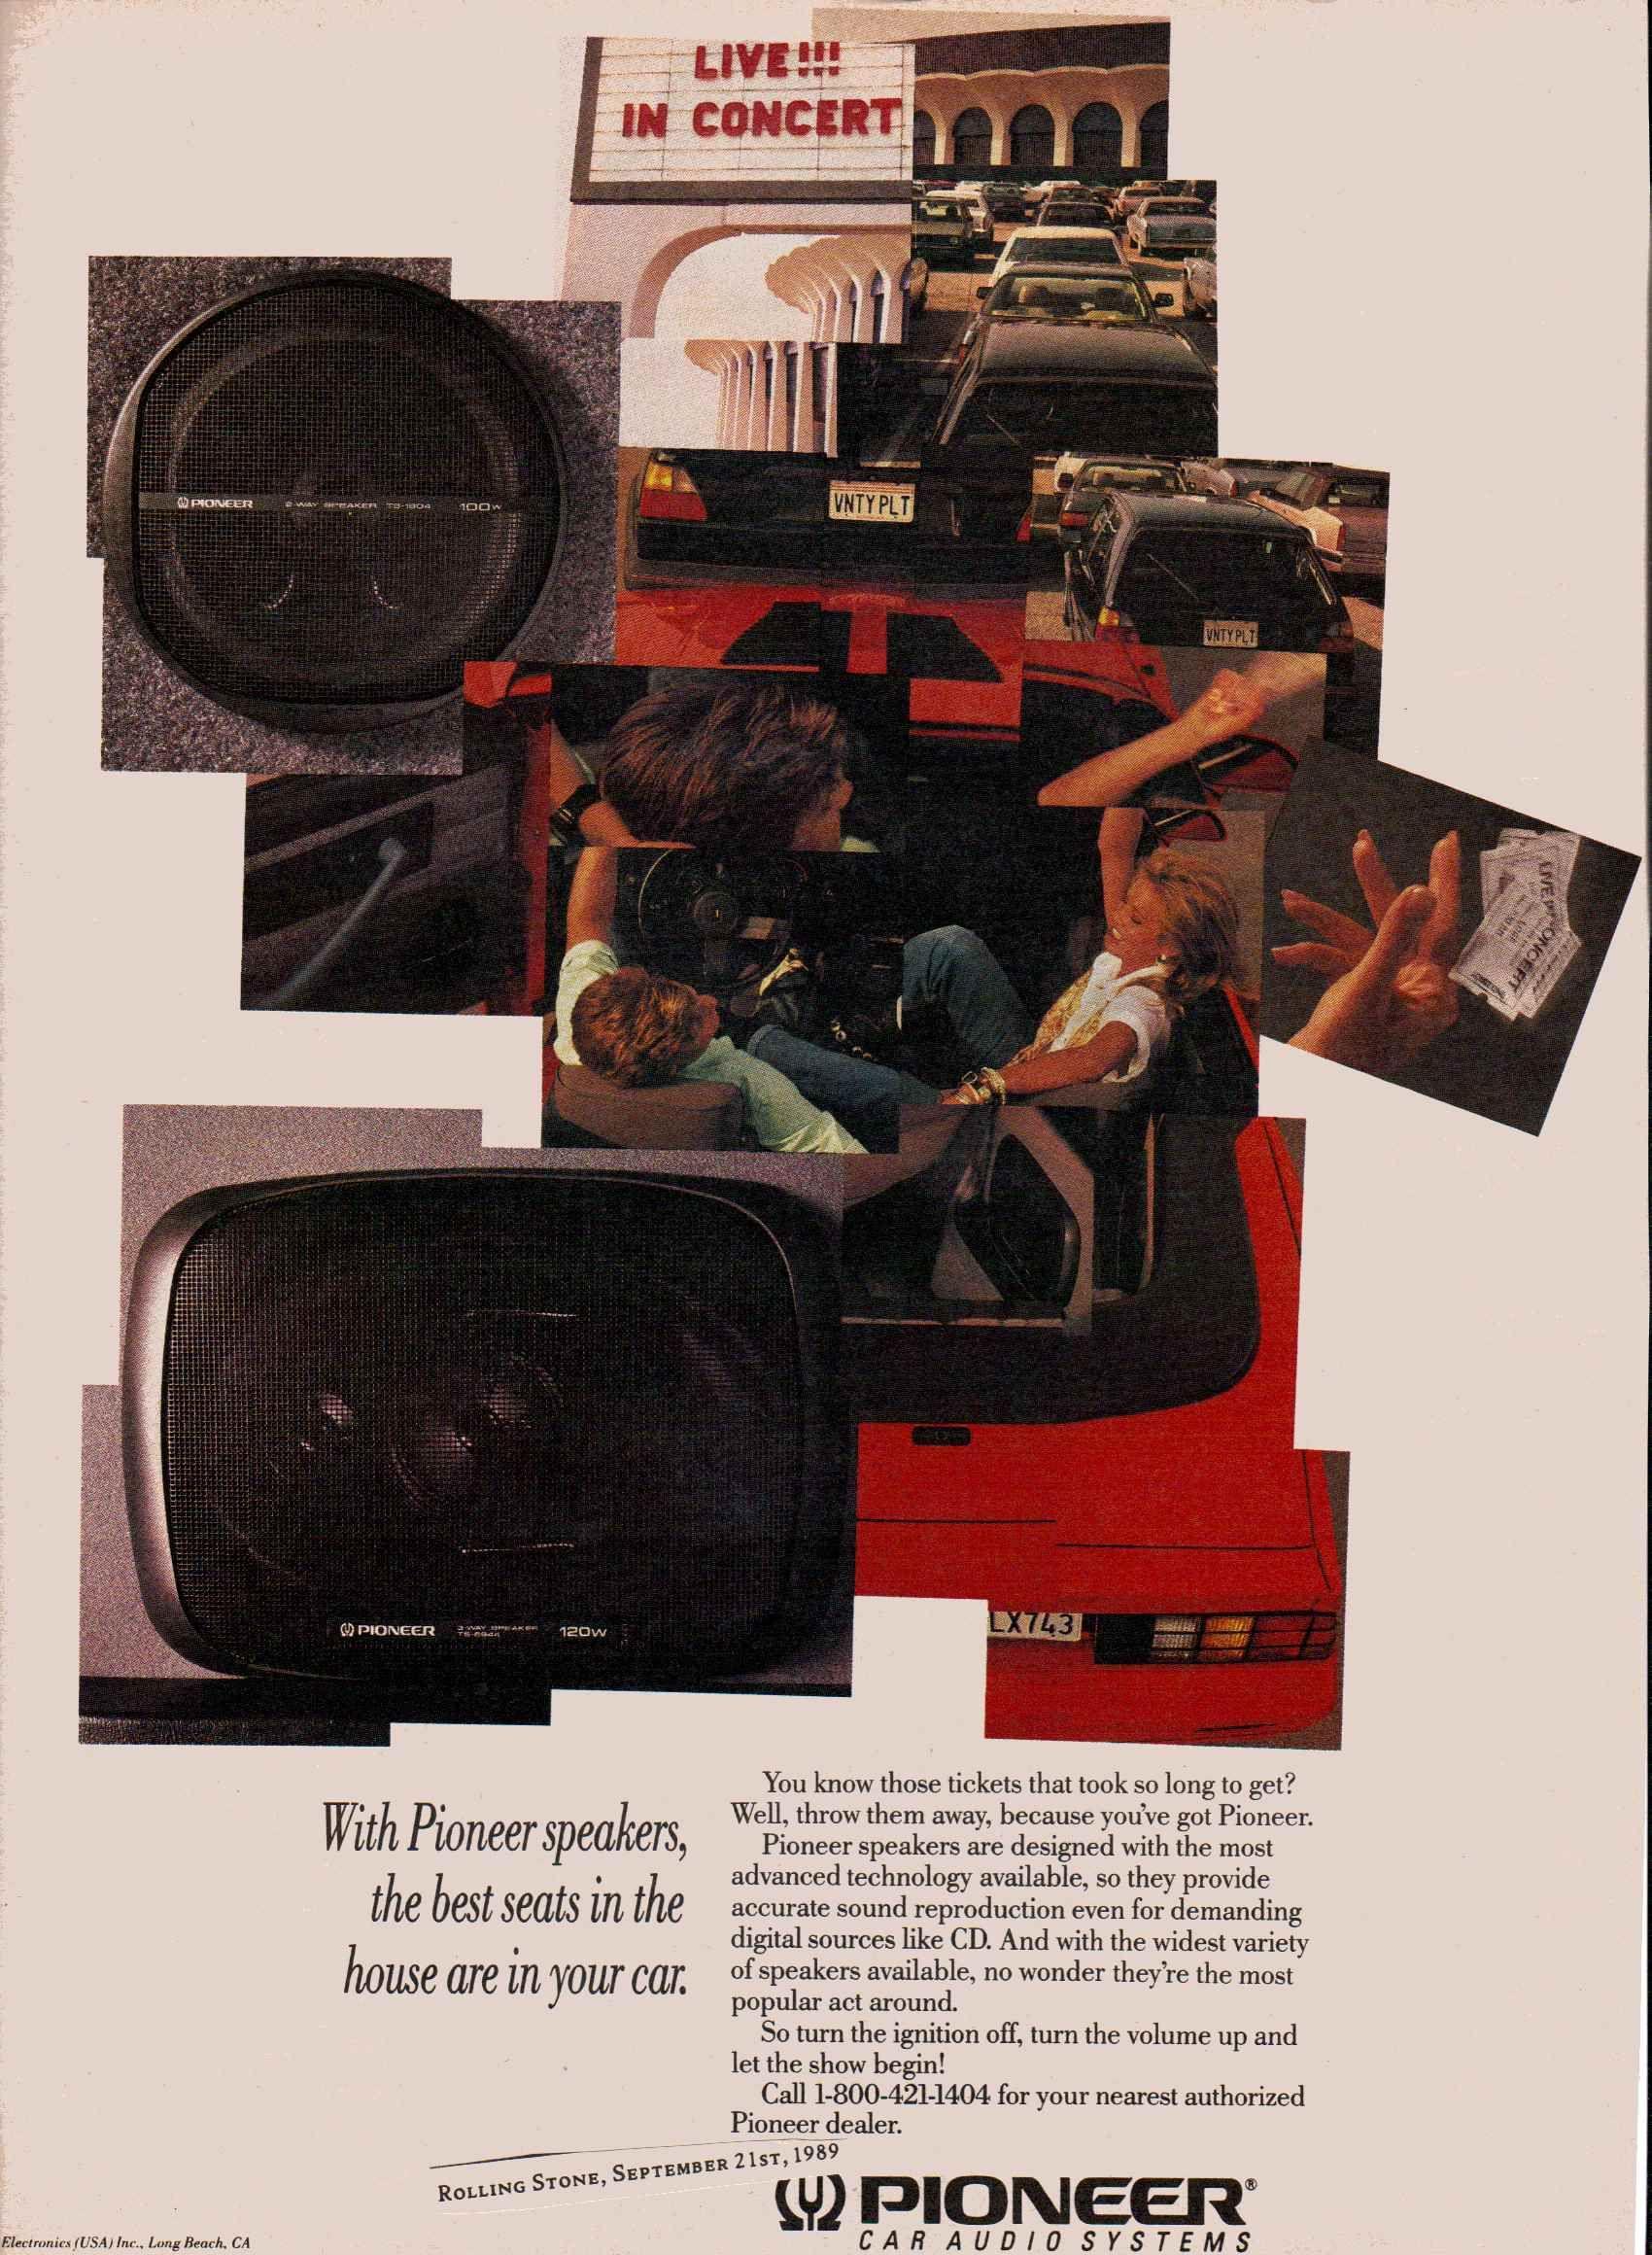 1989 pioneer ts 6944 car speakers vintage car audio ads vinyle r tro. Black Bedroom Furniture Sets. Home Design Ideas